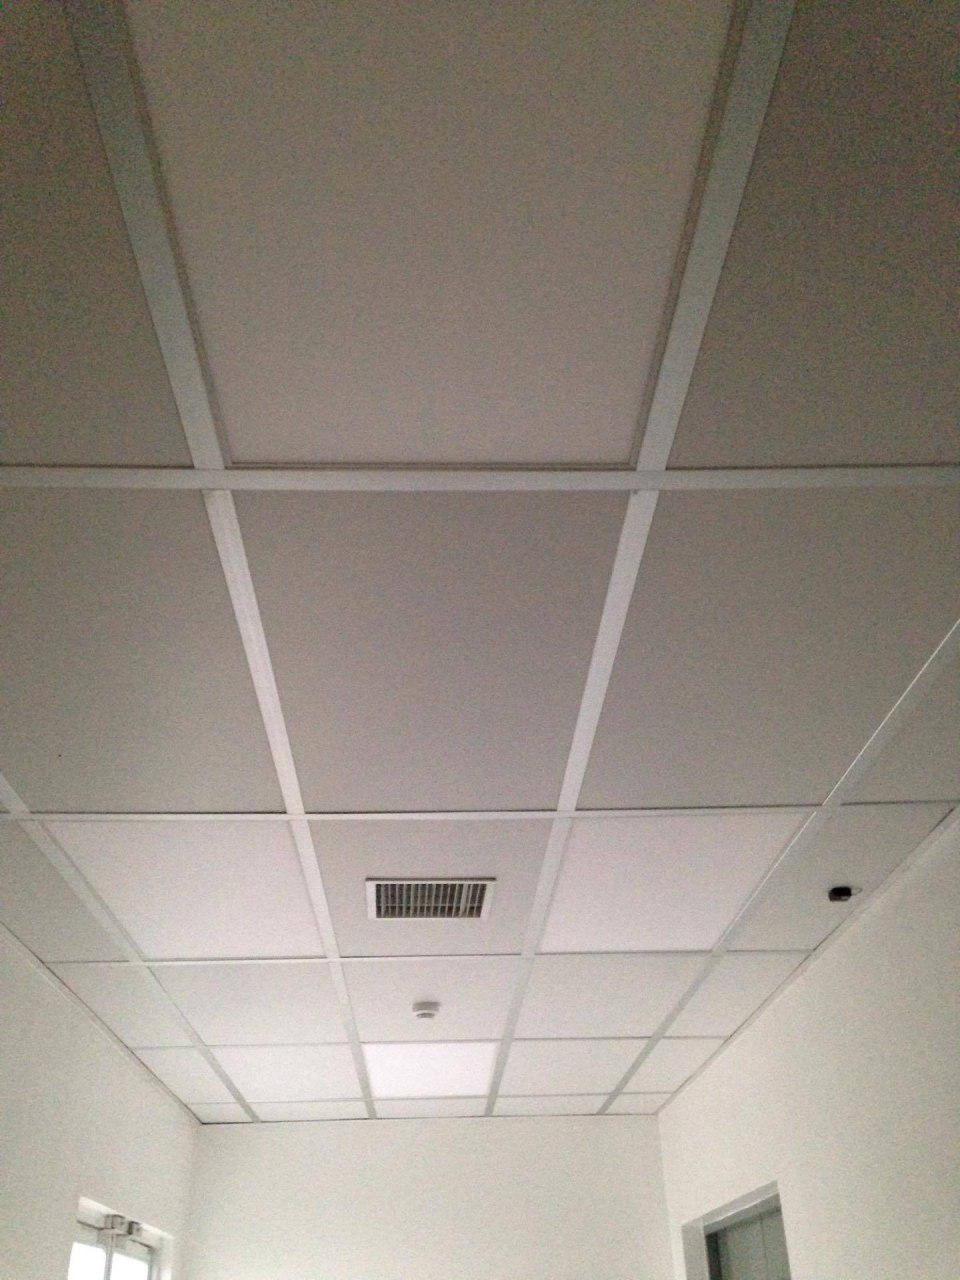 SPMC Hospital Installed LED Panel lights